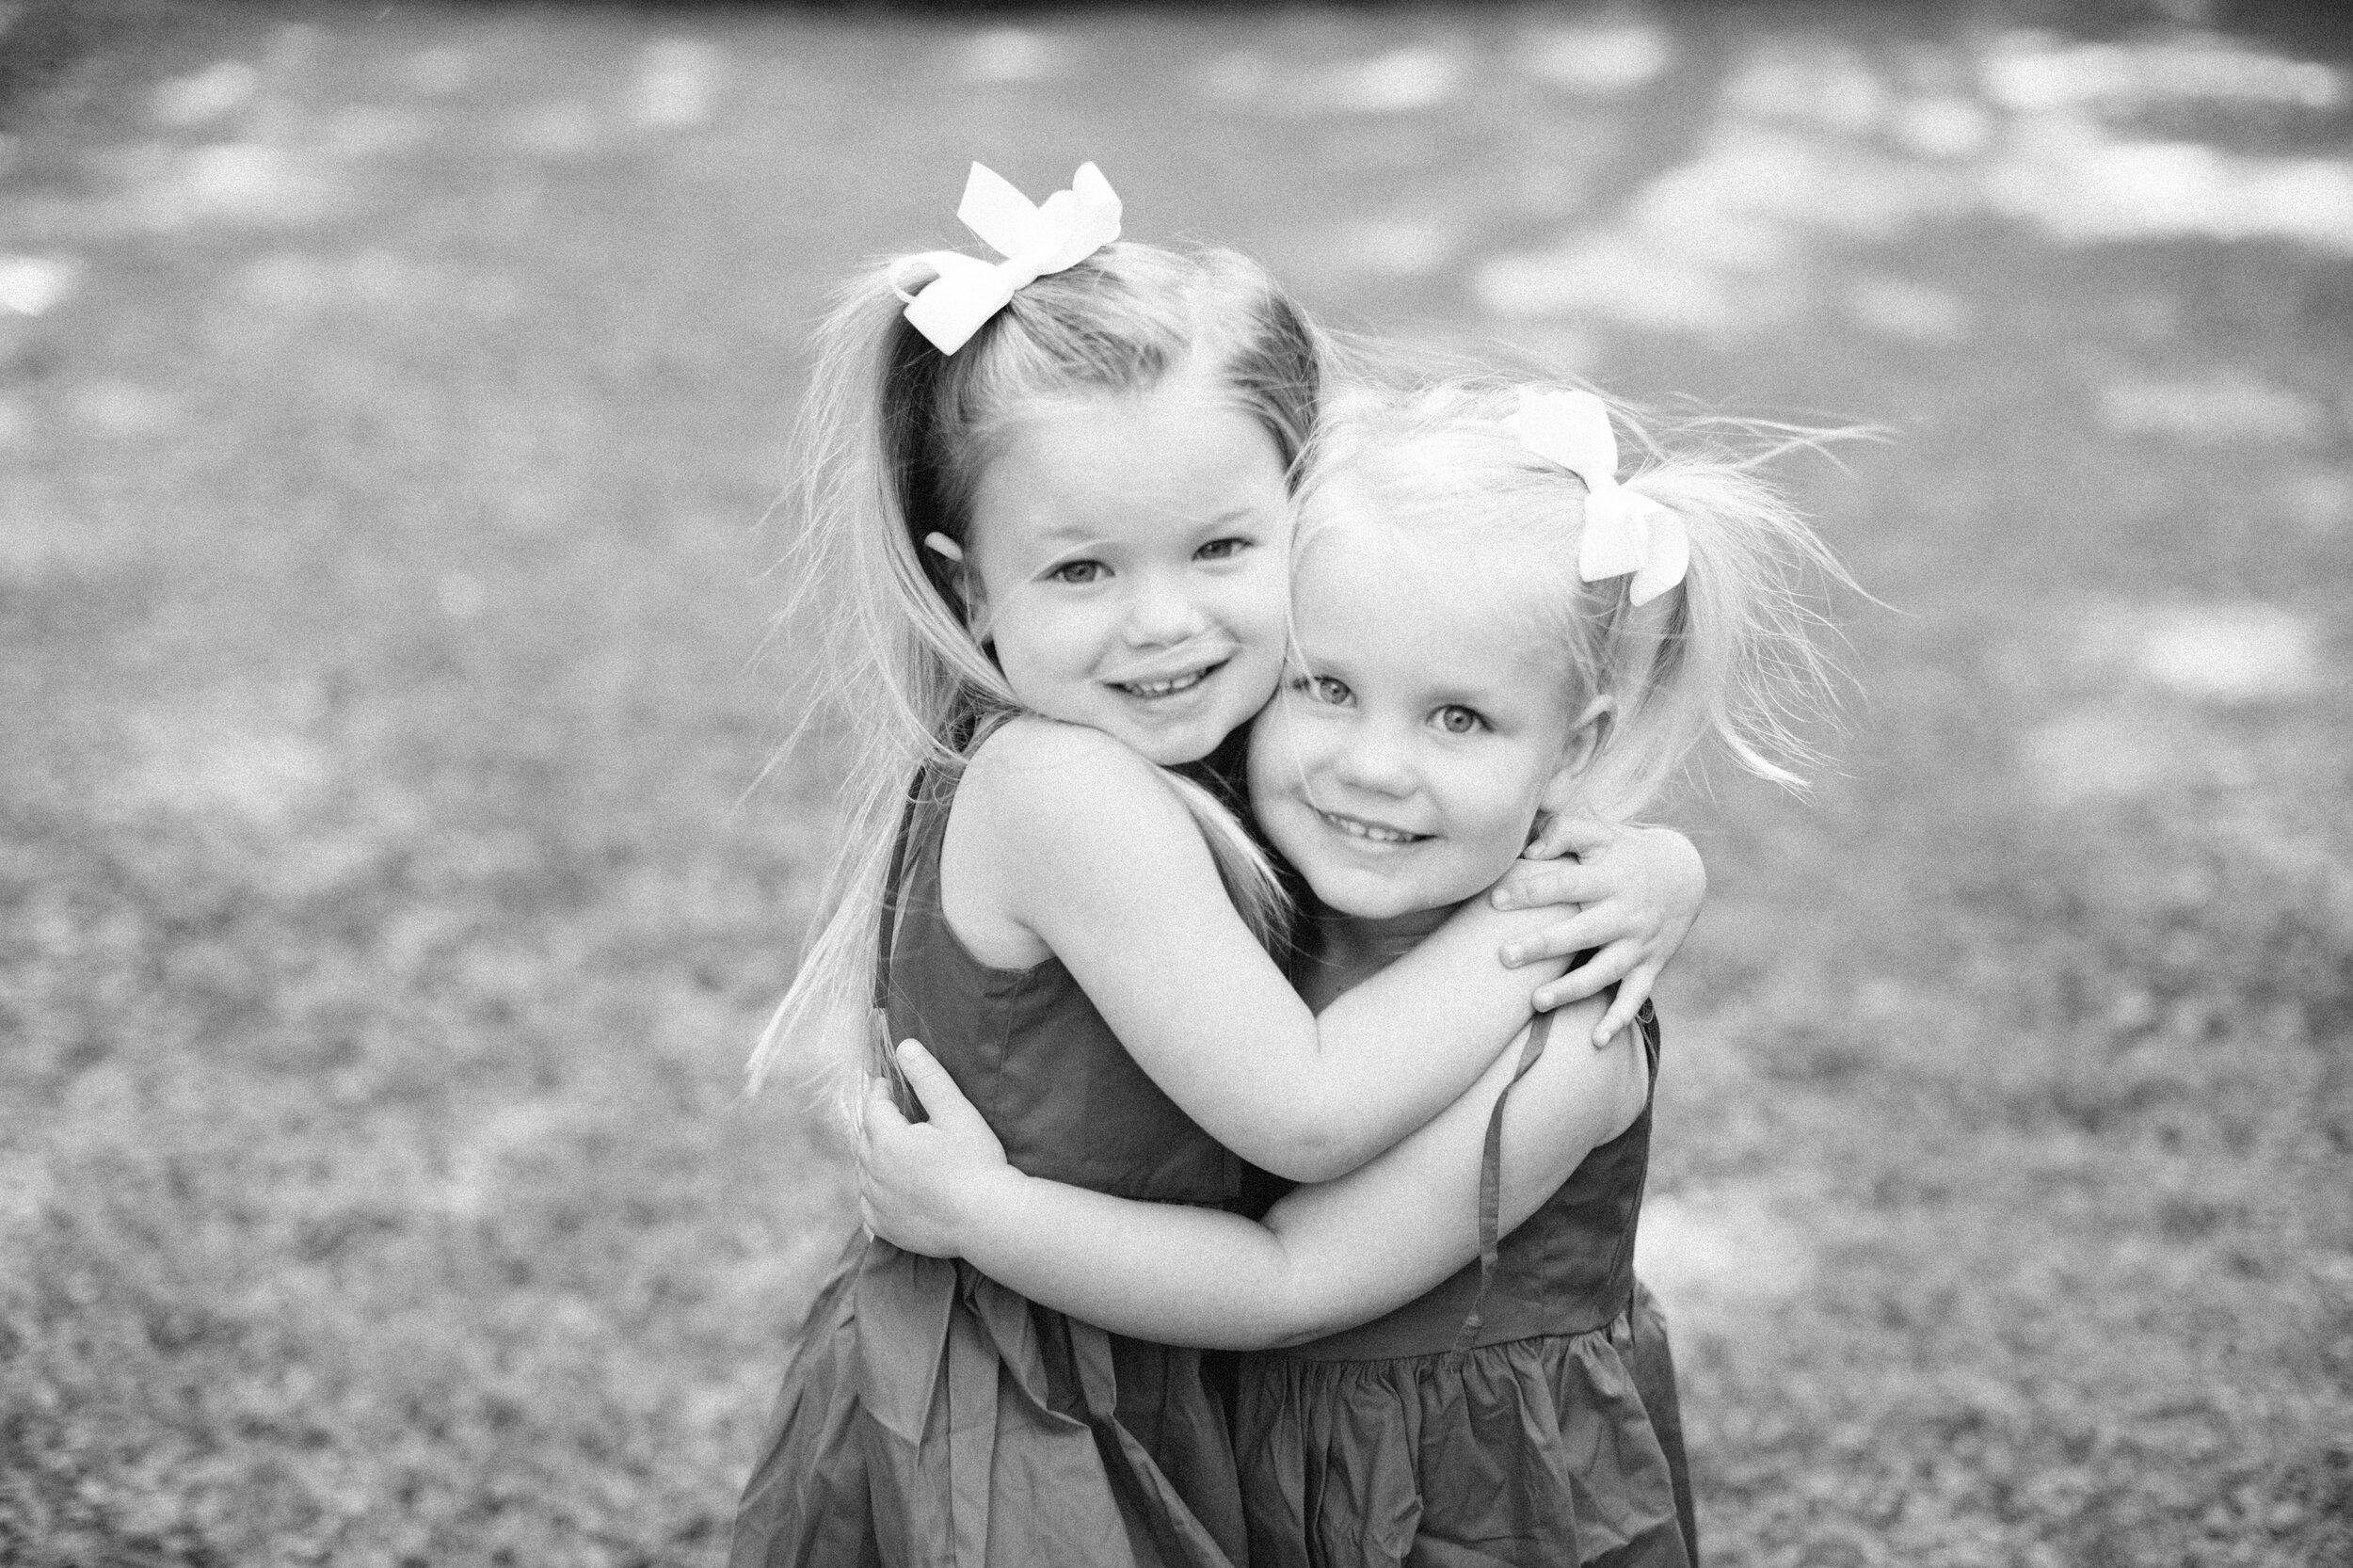 Clarke_Family_Mini_Abigail_Malone_Photography_Knoxville-14.jpg